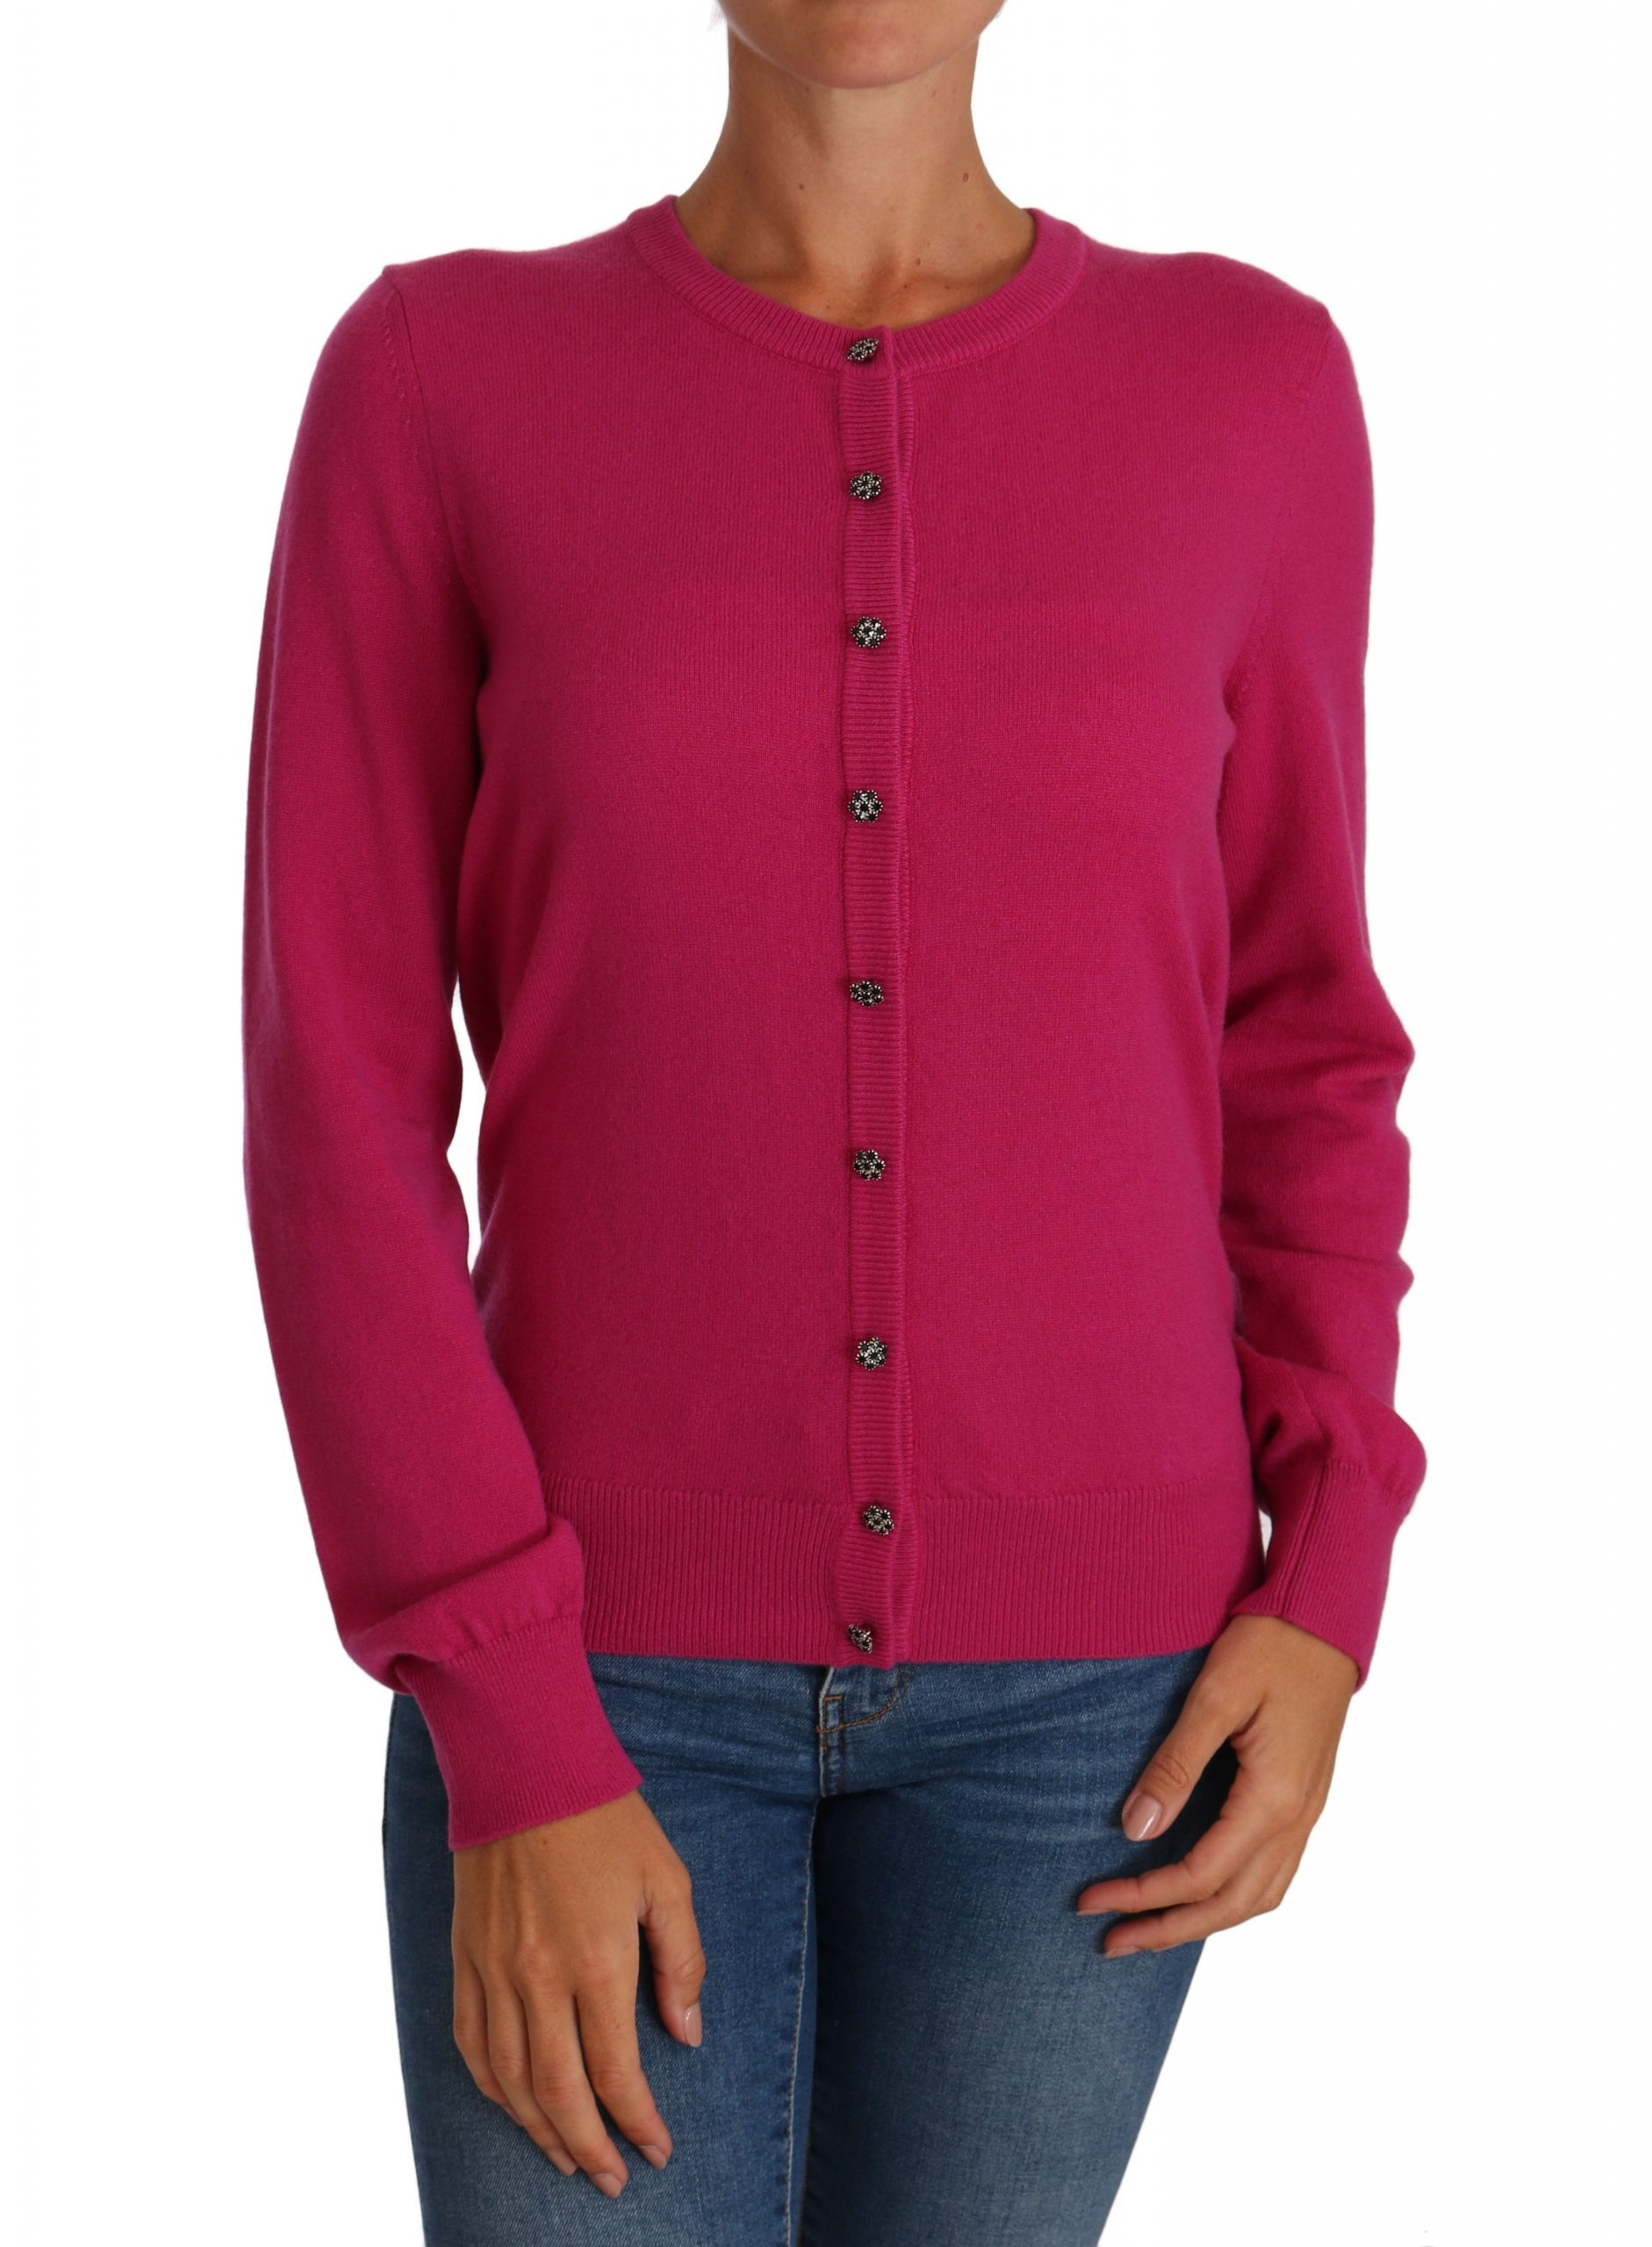 Dolce & Gabbana Women's Cashmere Pink Crystal Button Cardigan Pink PAN60962 - IT44|L